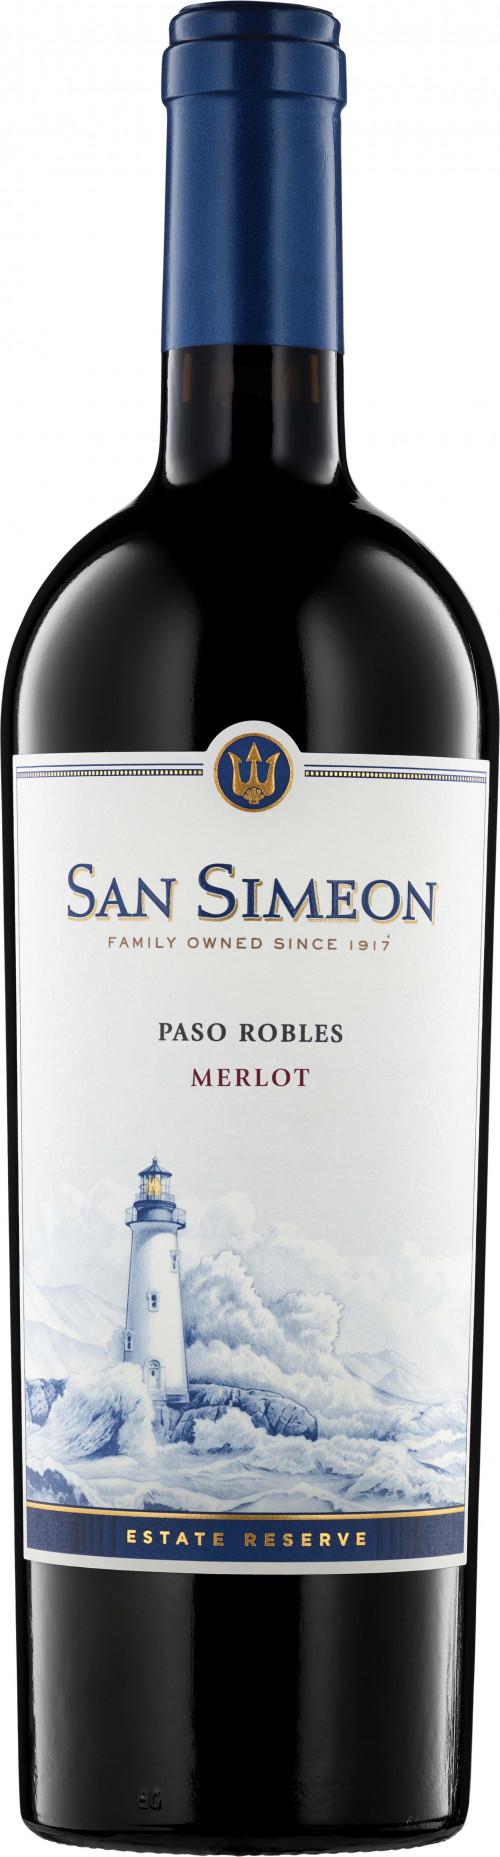 2017 San Simeon Paso Robles Merlot 750ml